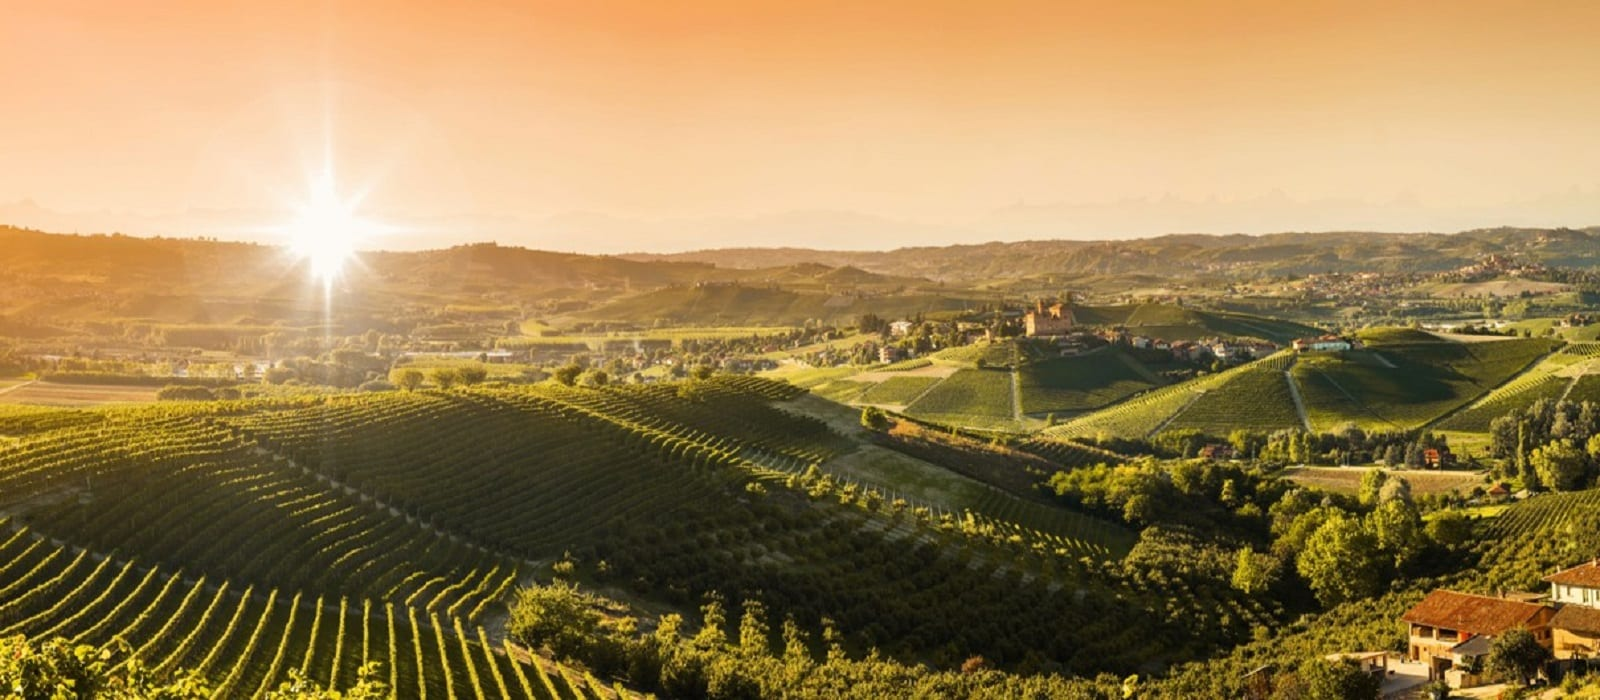 unipol-climate-agriculture-farming